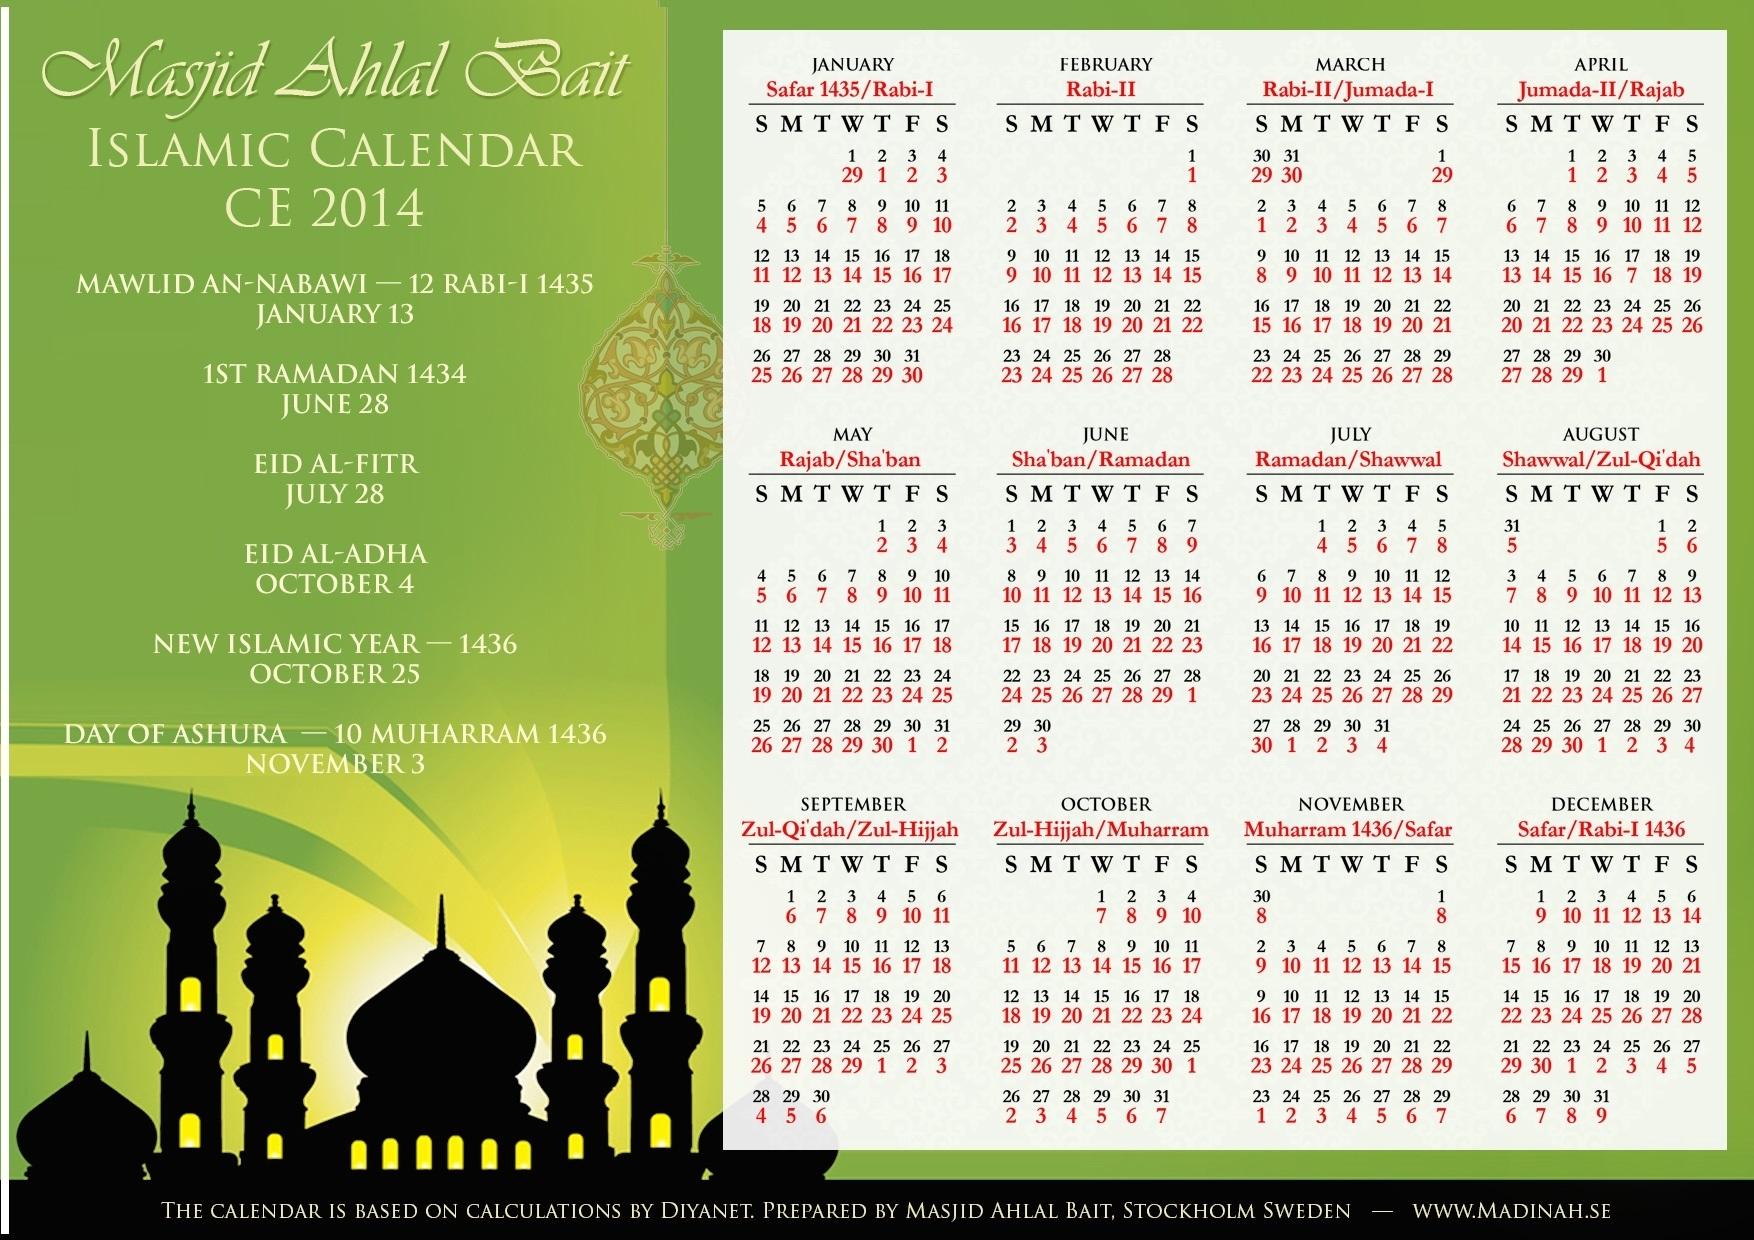 3 Blessed Days In Islamic Calendar - Quran O Sunnat